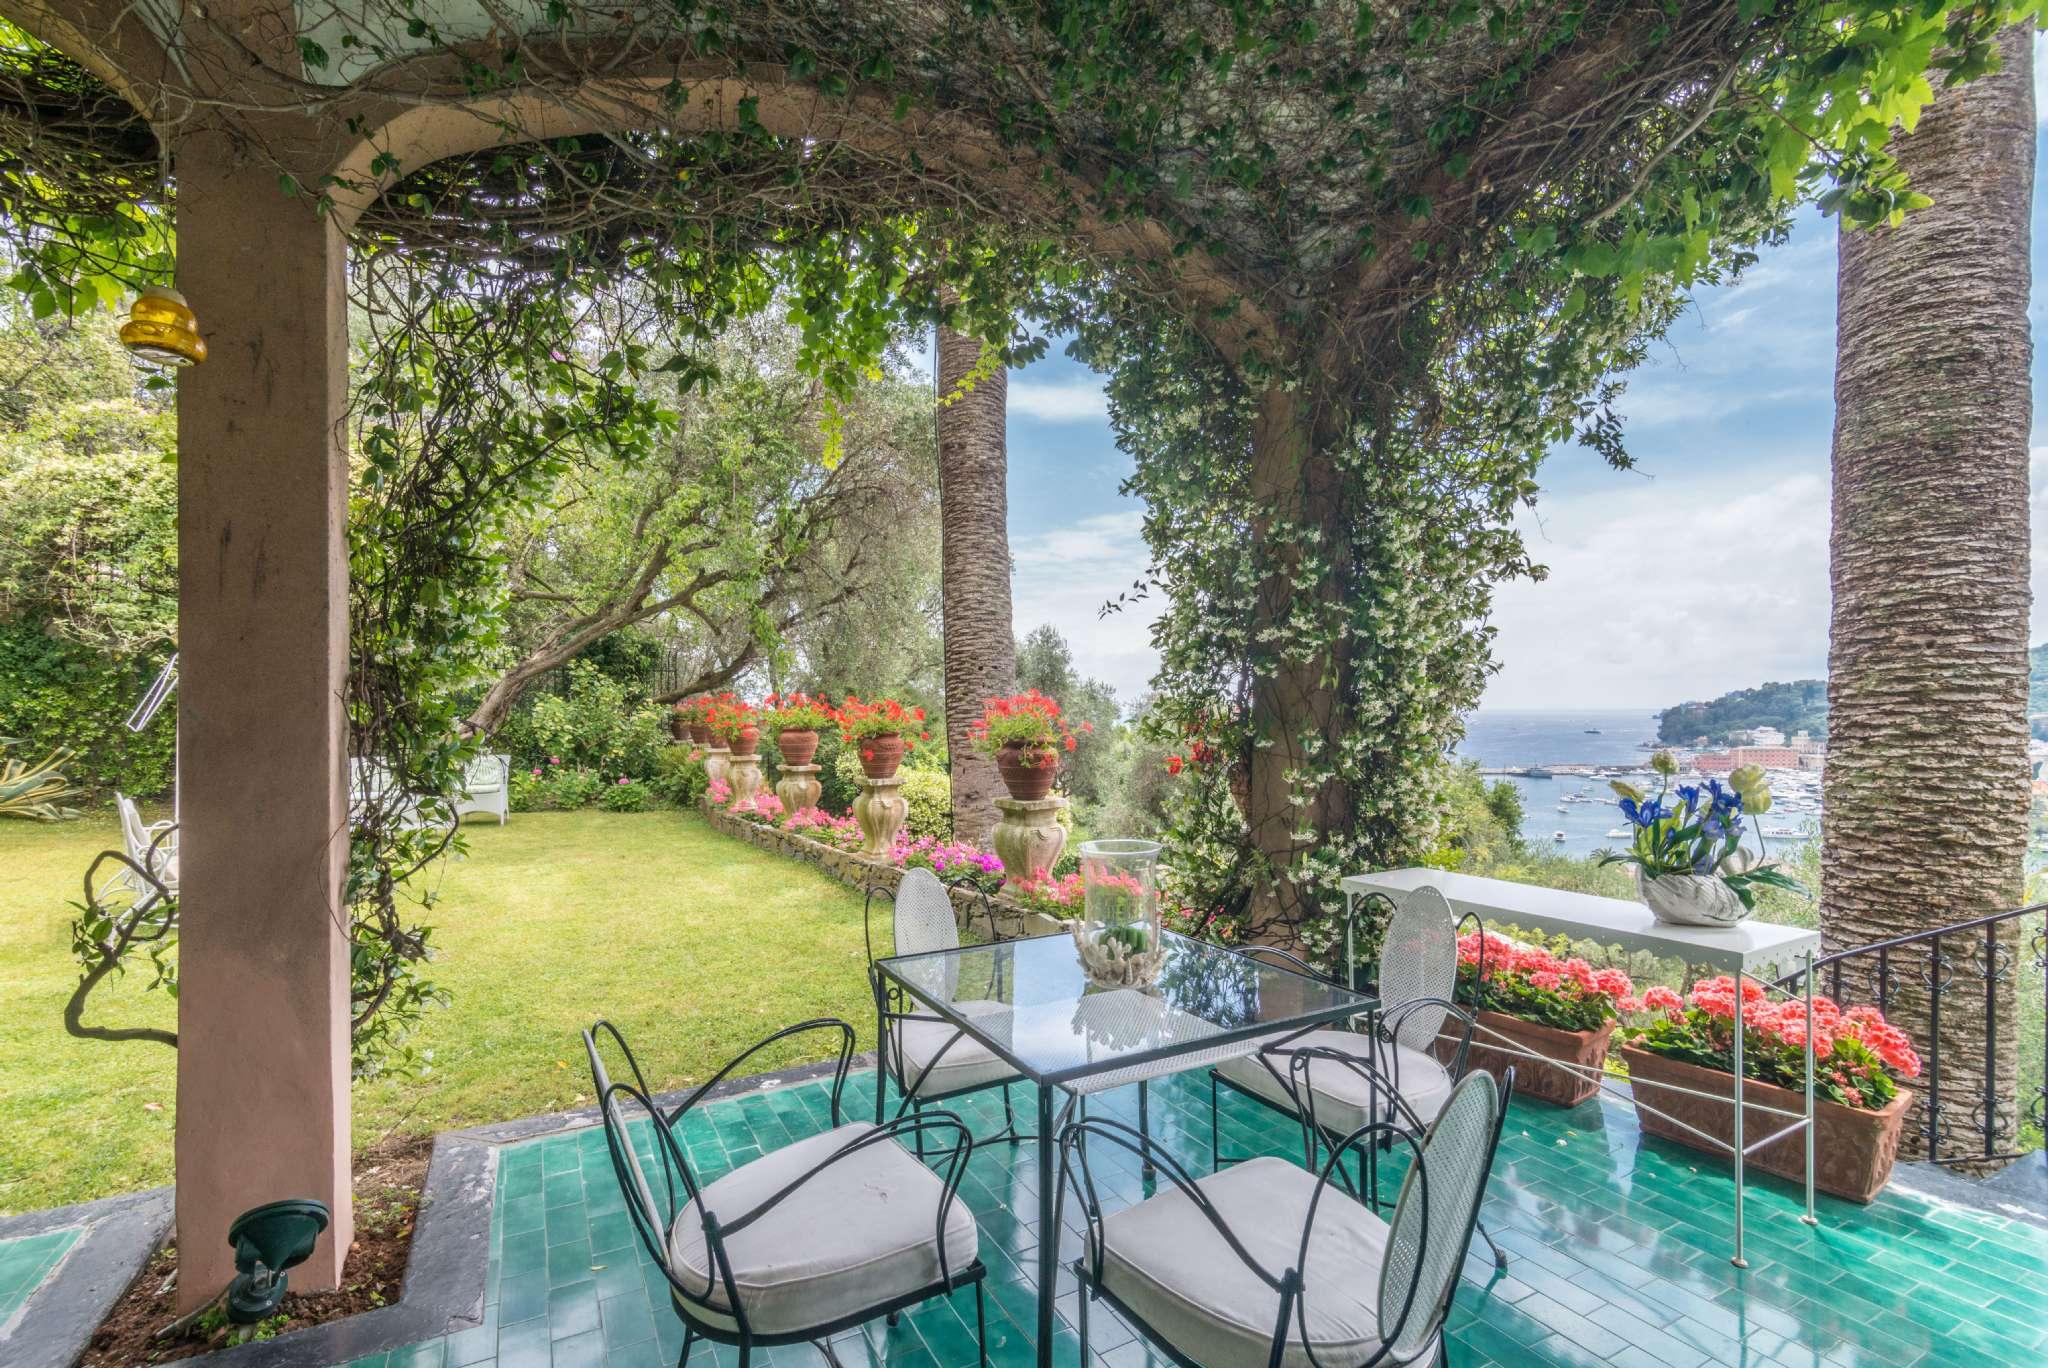 Villa in Vendita a Santa Margherita Ligure: 0 locali, 530 mq - Foto 7